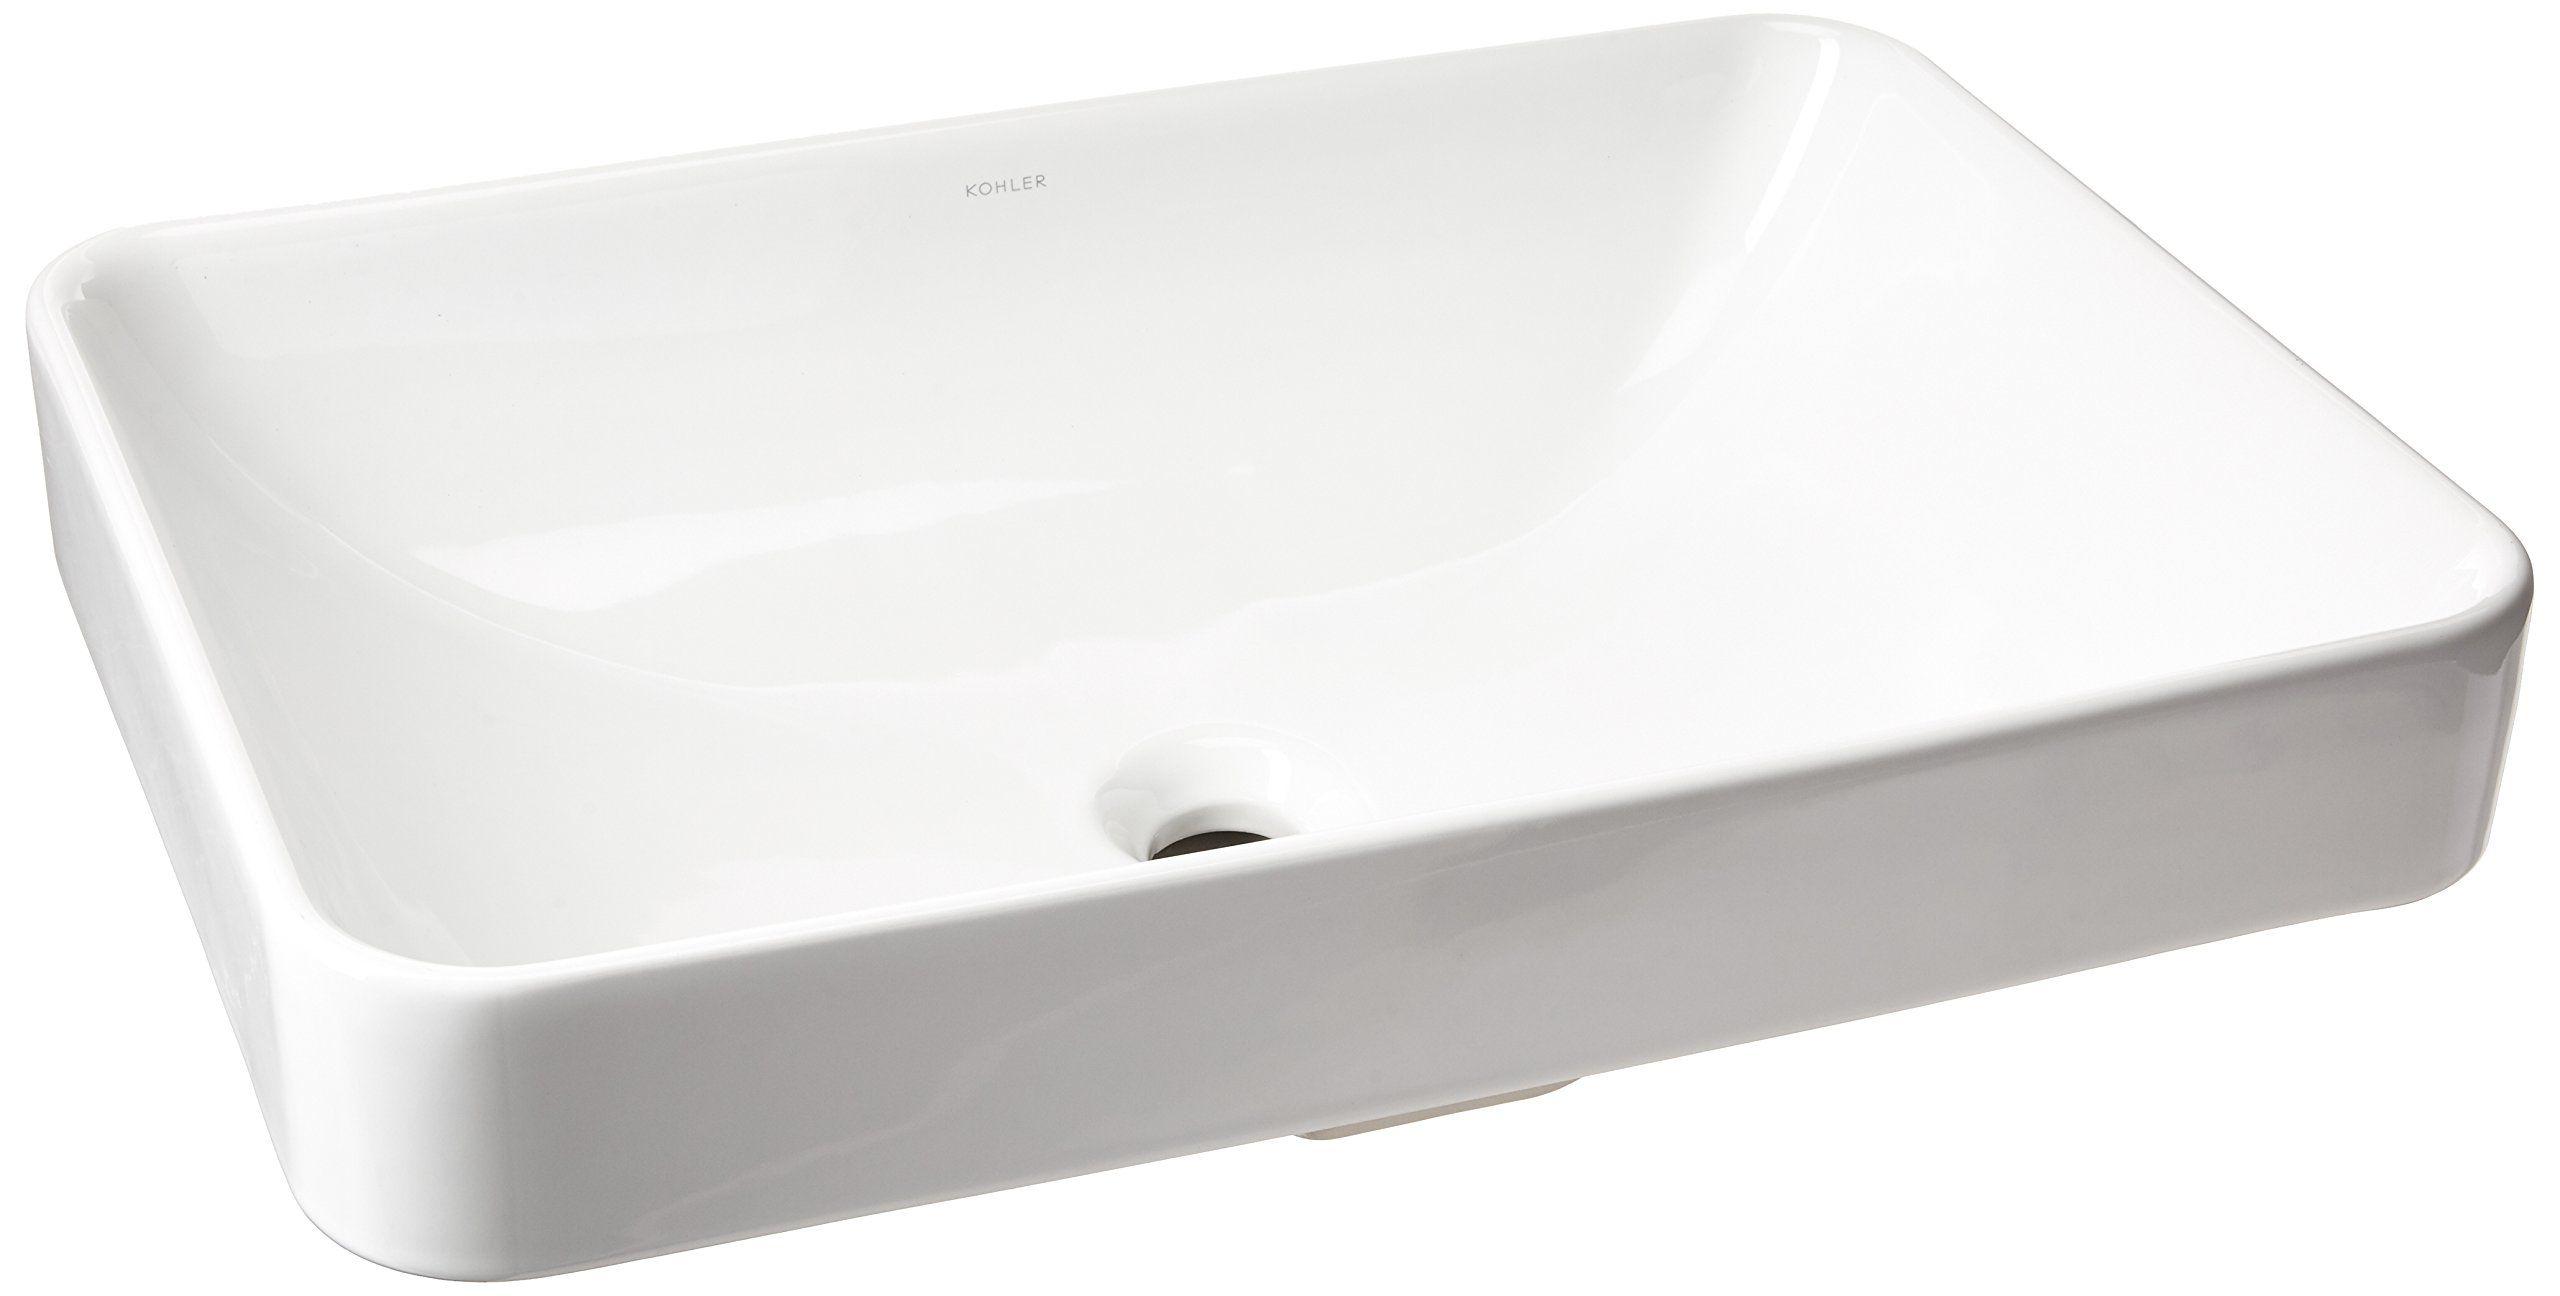 Kohler K53730 Vox Rectangle Vessel Abovecounter Bathroom Sink White Click Image To Review More Details It I In 2020 Above Counter Bathroom Sink Bathroom Sink Sink